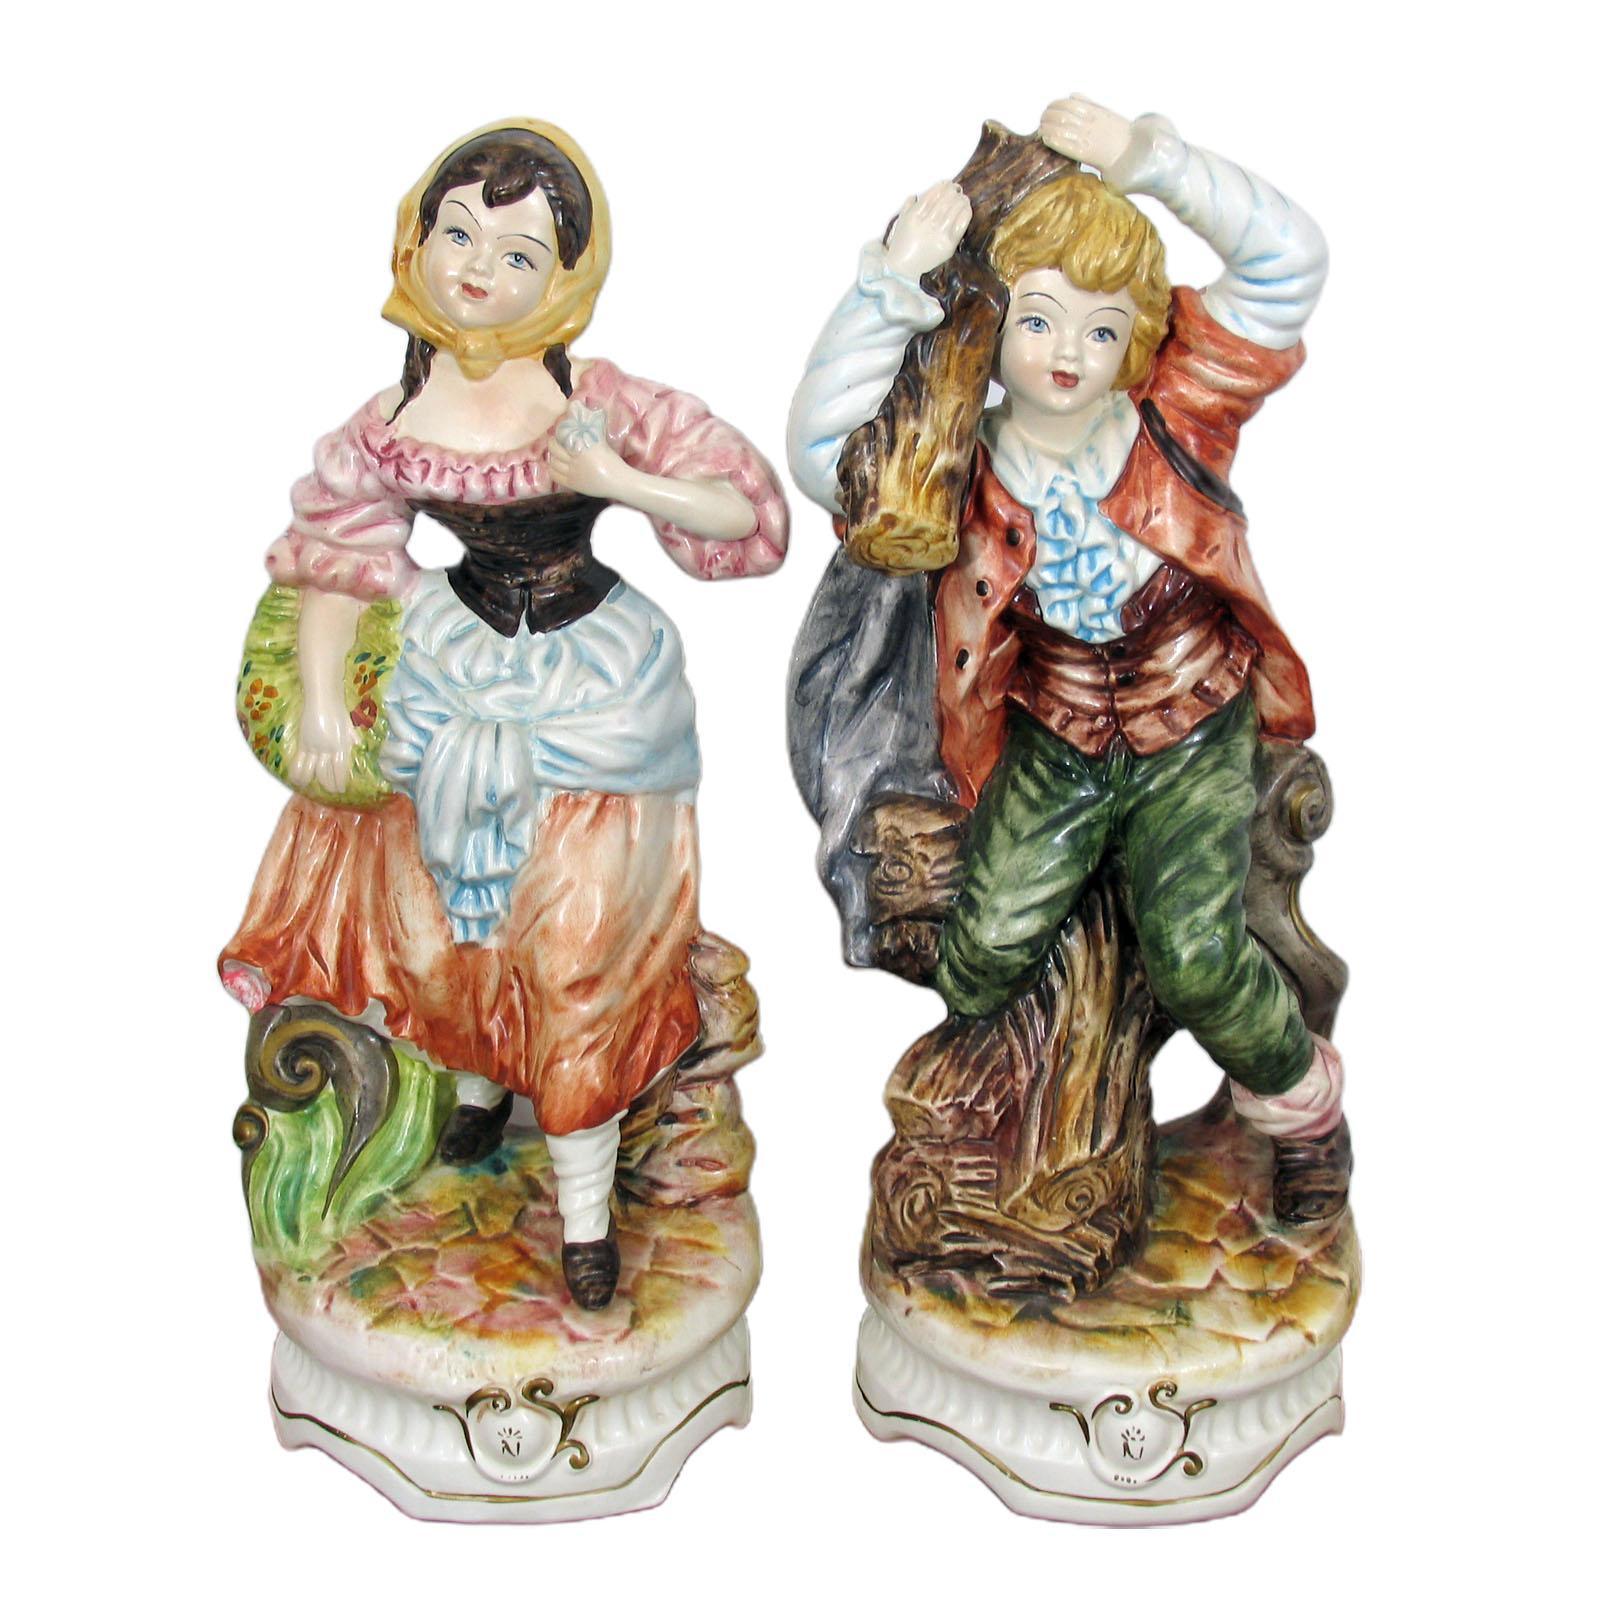 Pair of Large Porcelain Capodimonte Figurines